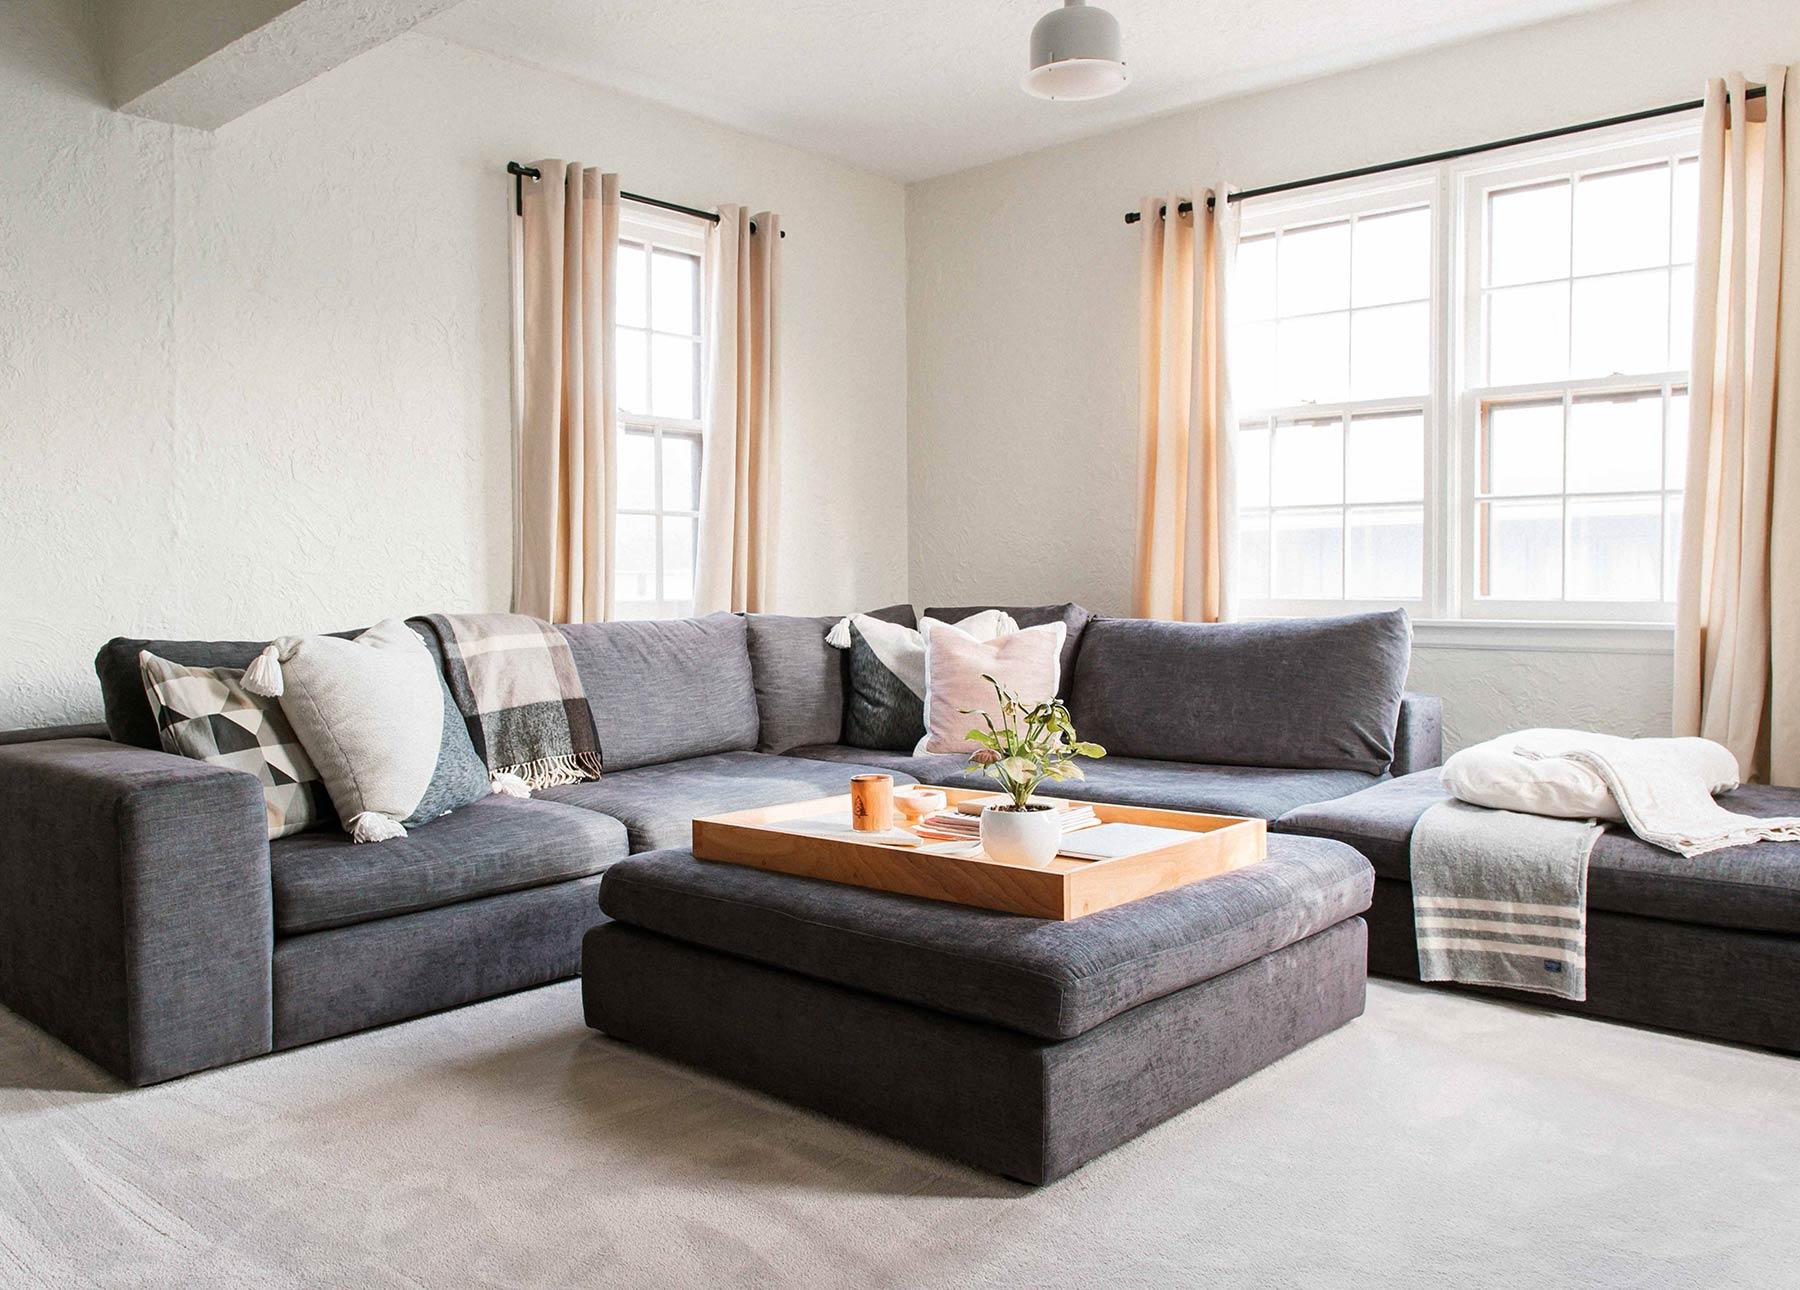 Modern Furniture Style Guide: Modular Sofas | Articulate